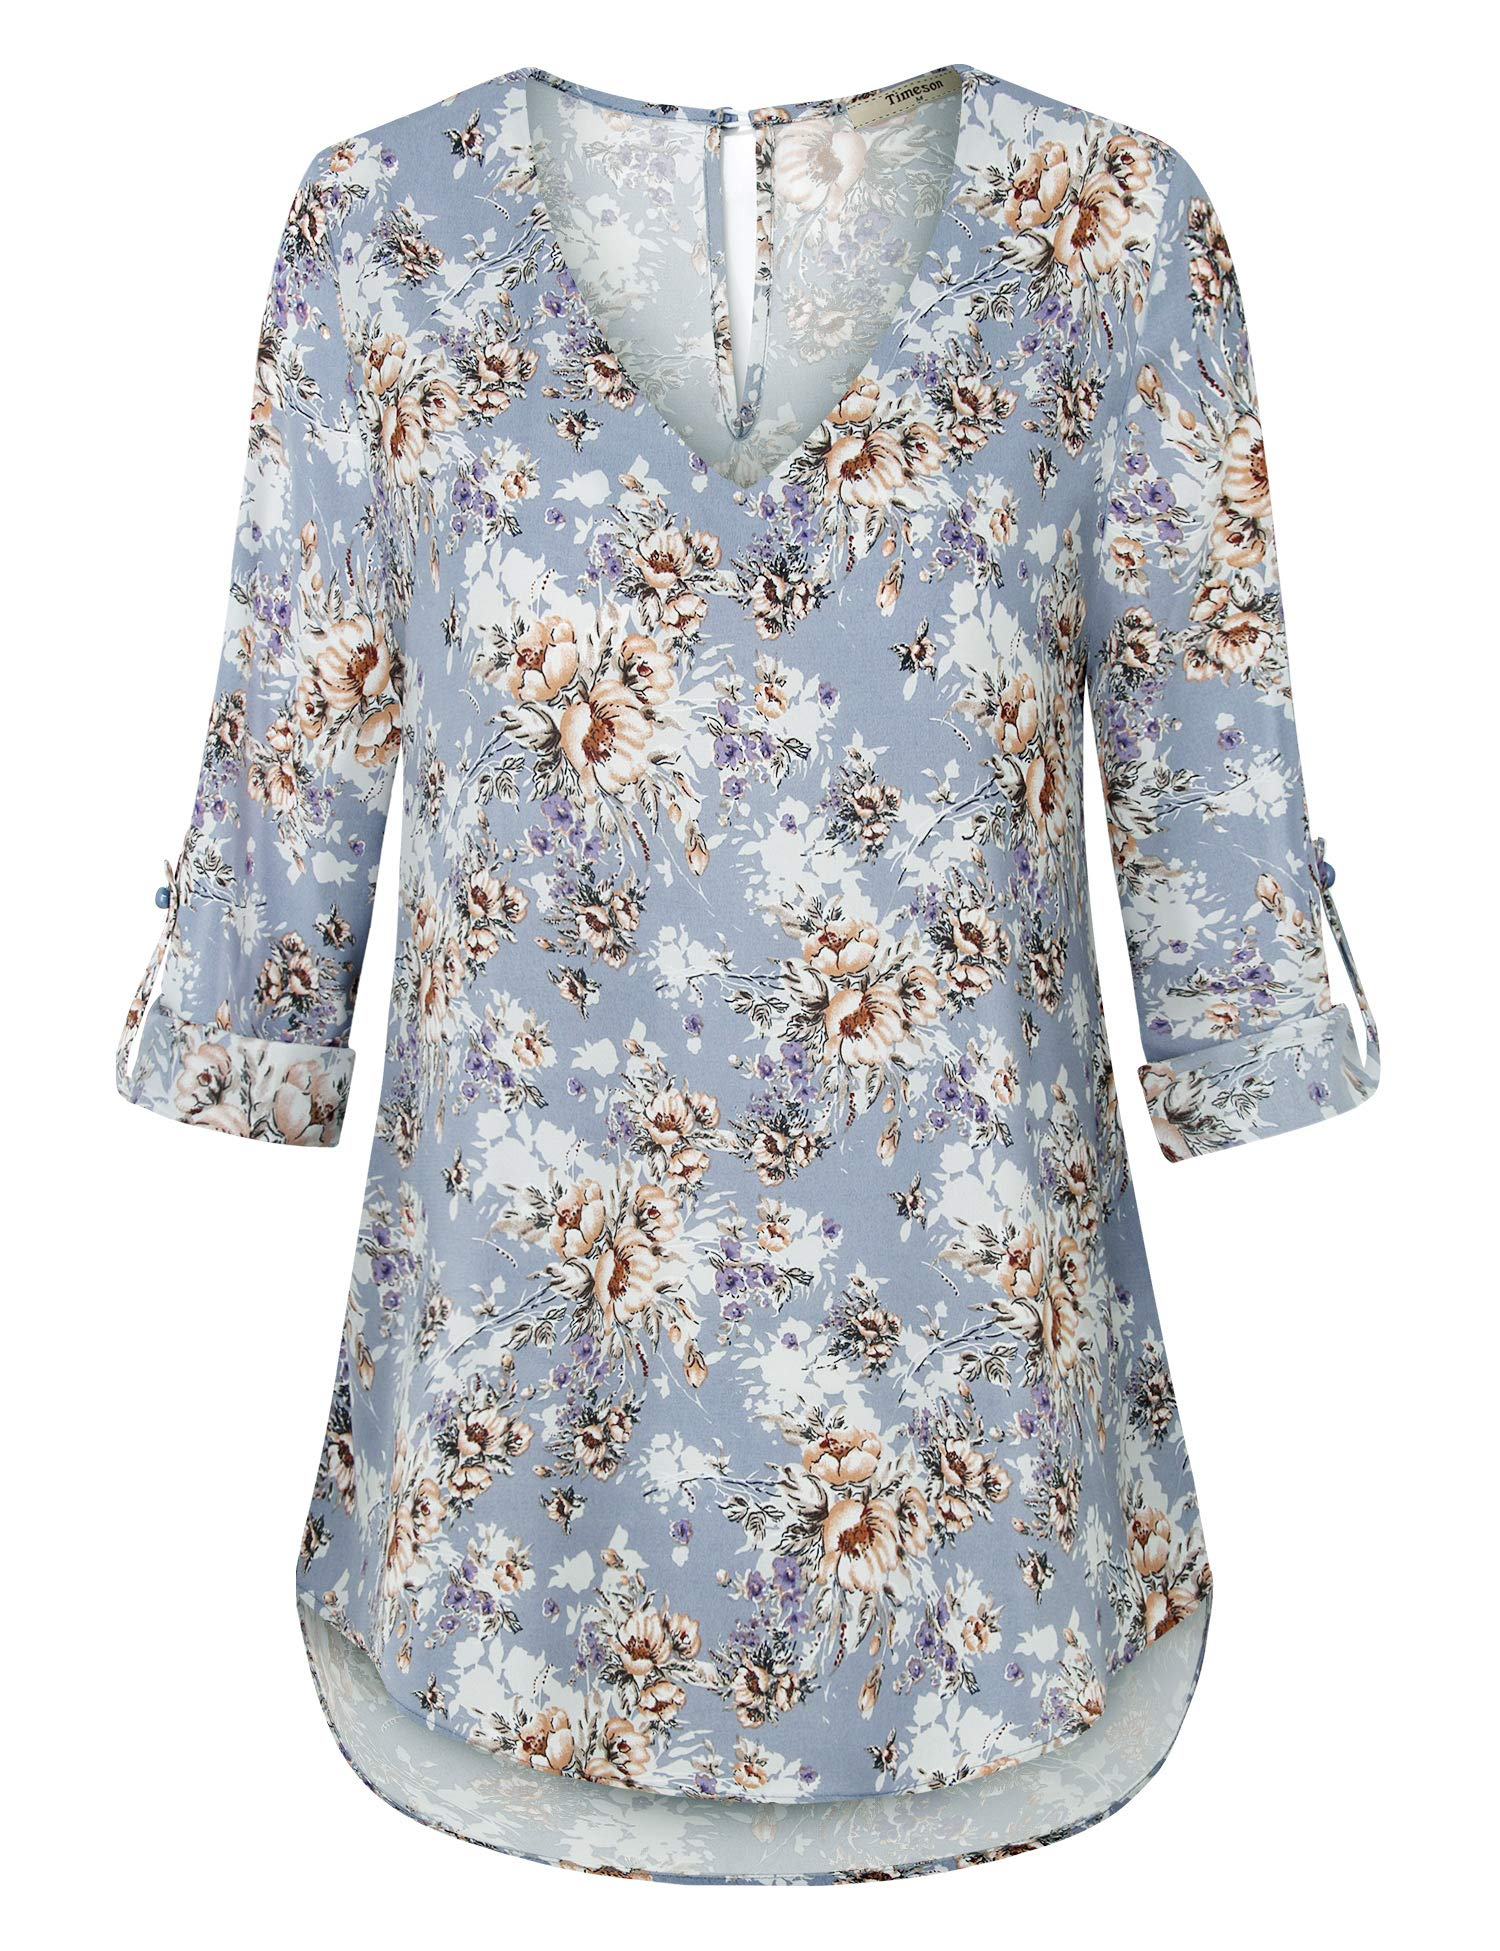 Timeson Women's V Neck Chiffon Blouses 3/4 Sleeve Button Down Tunics Tops